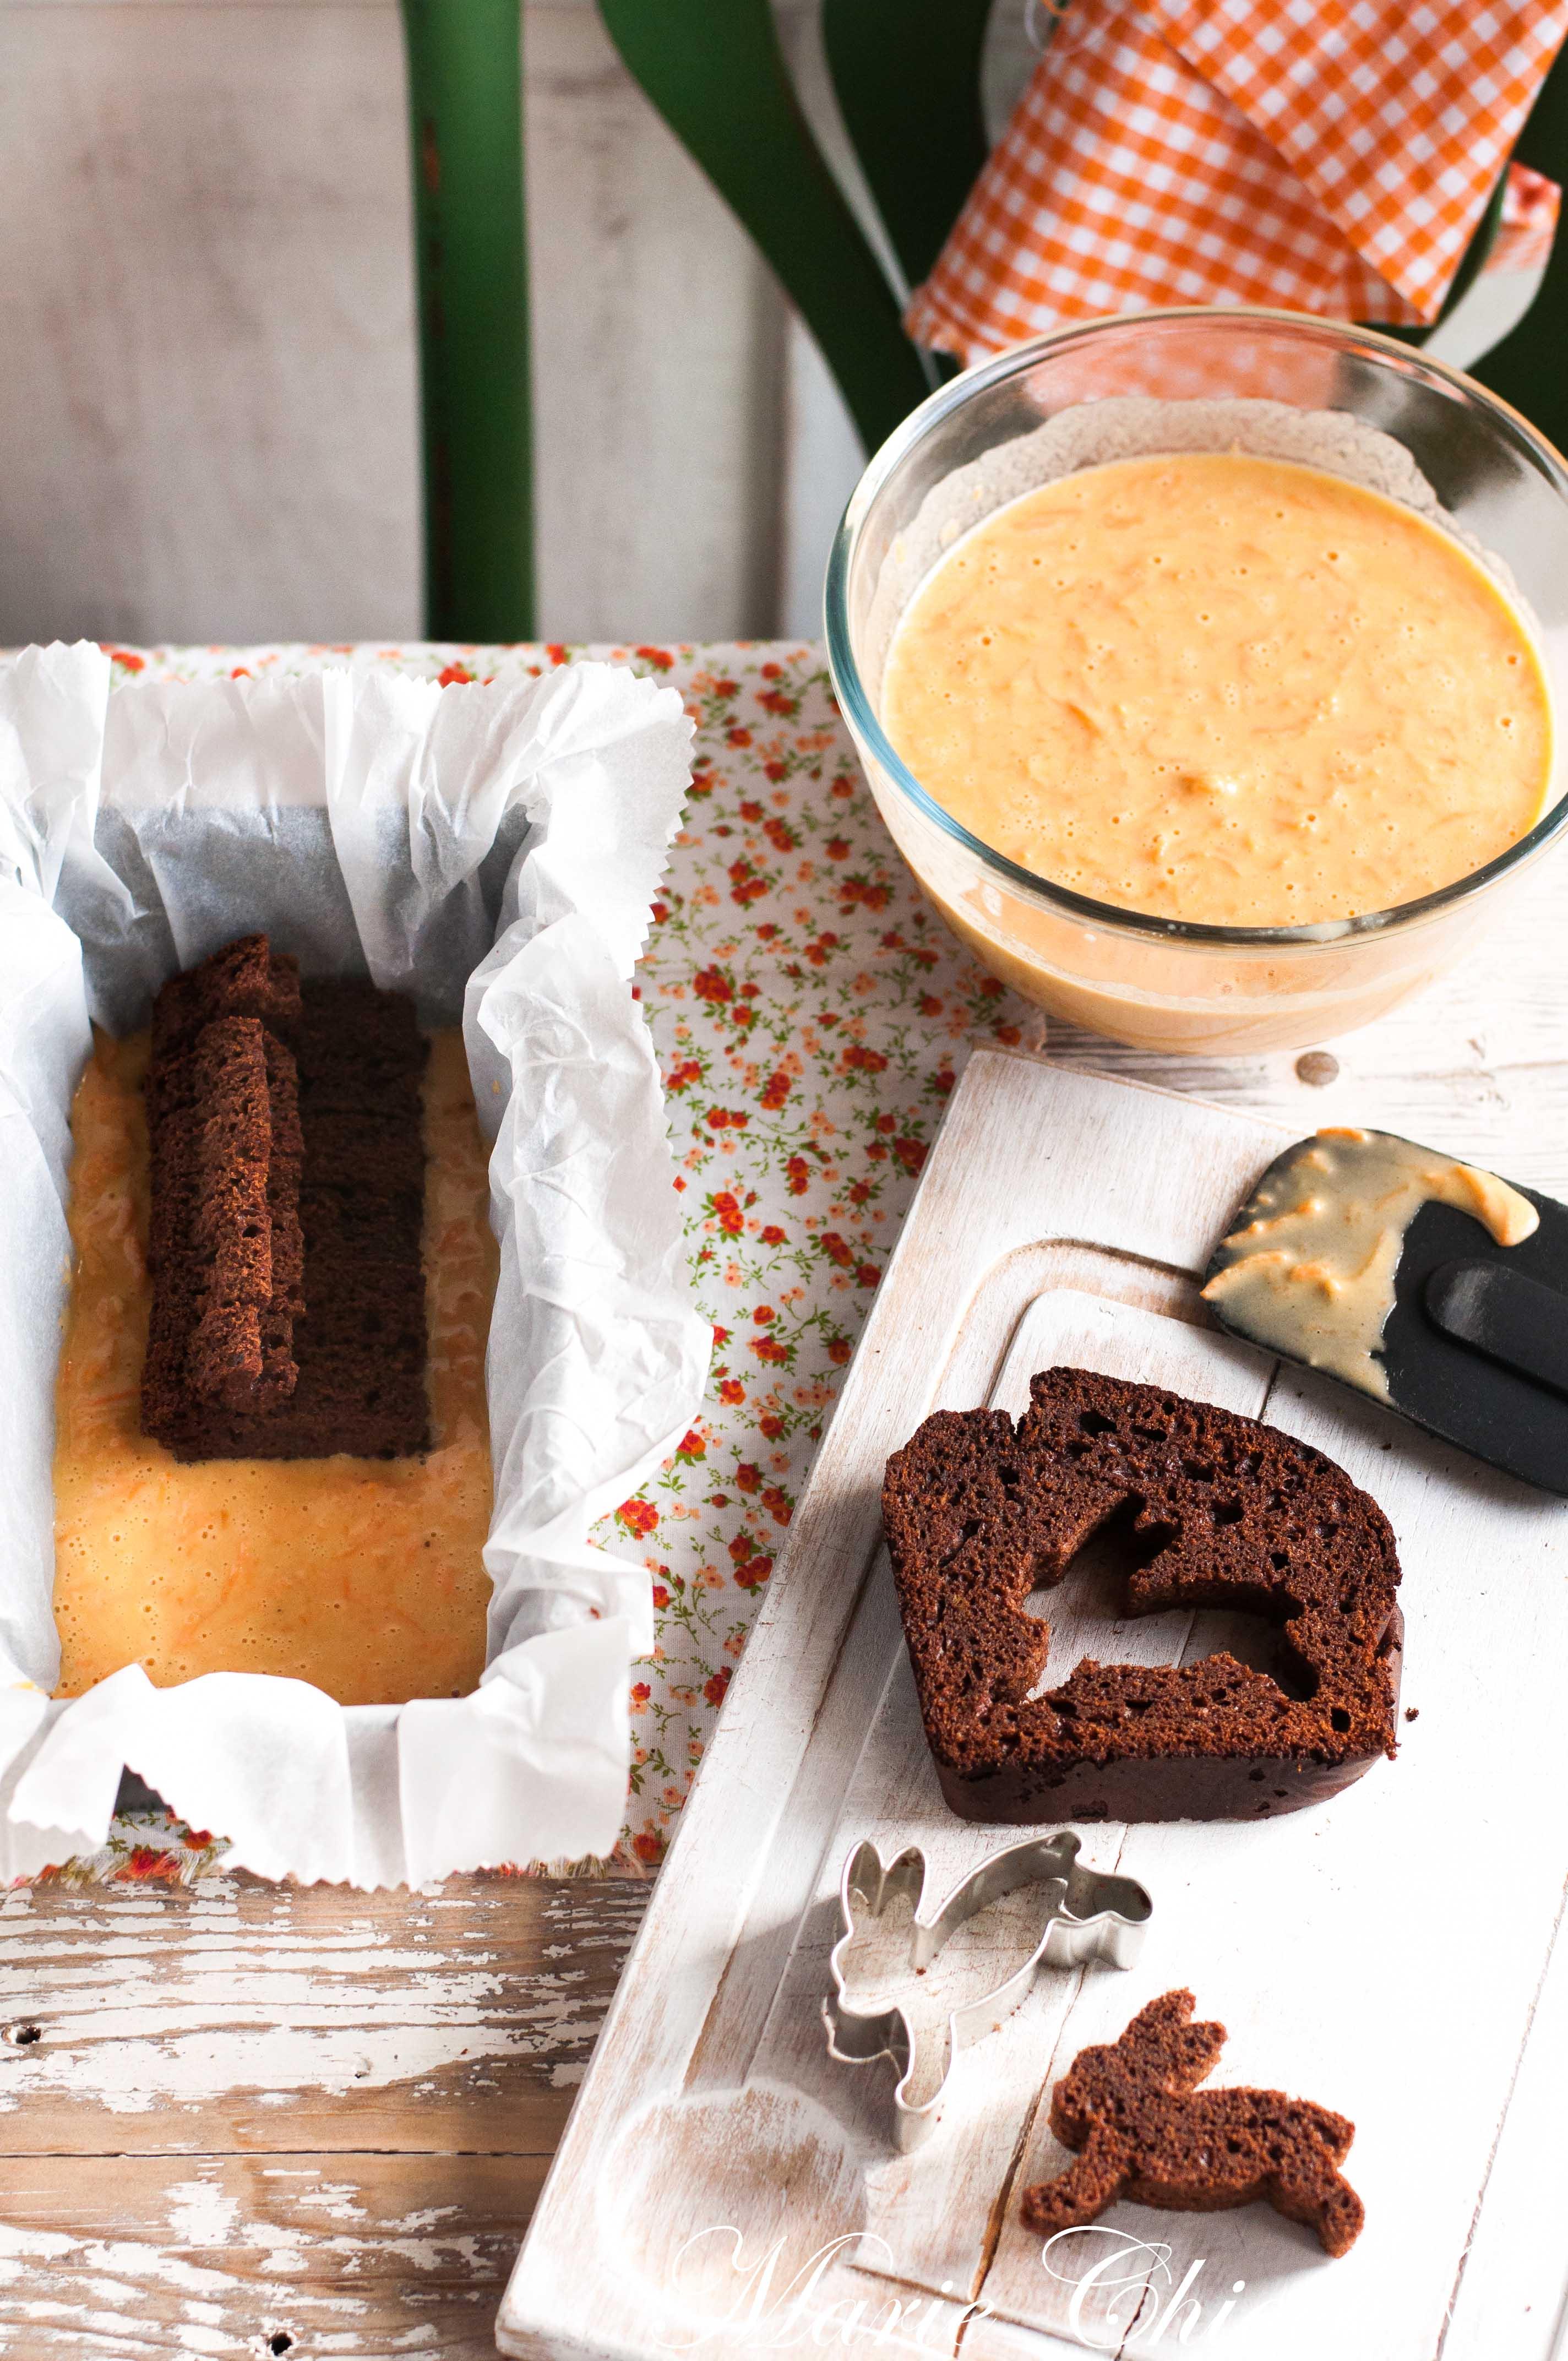 Carrot-cake surprise